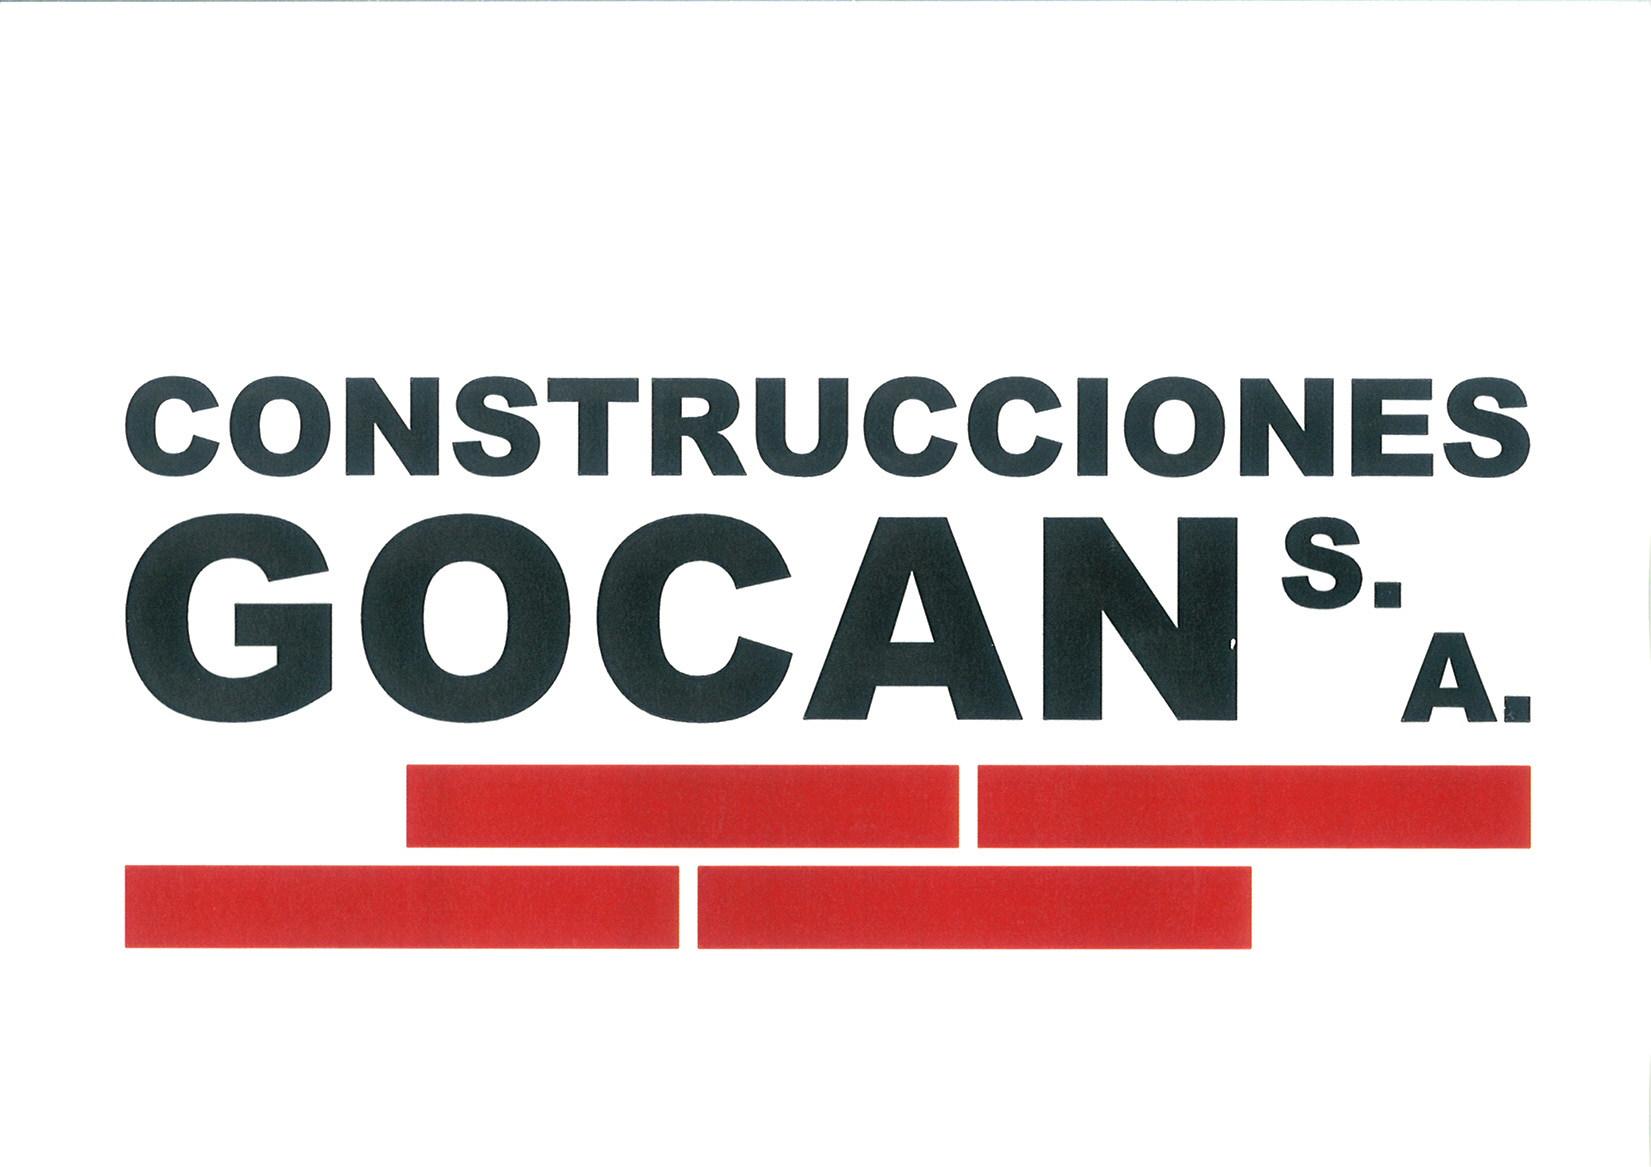 Construcciones Gocan S.A.